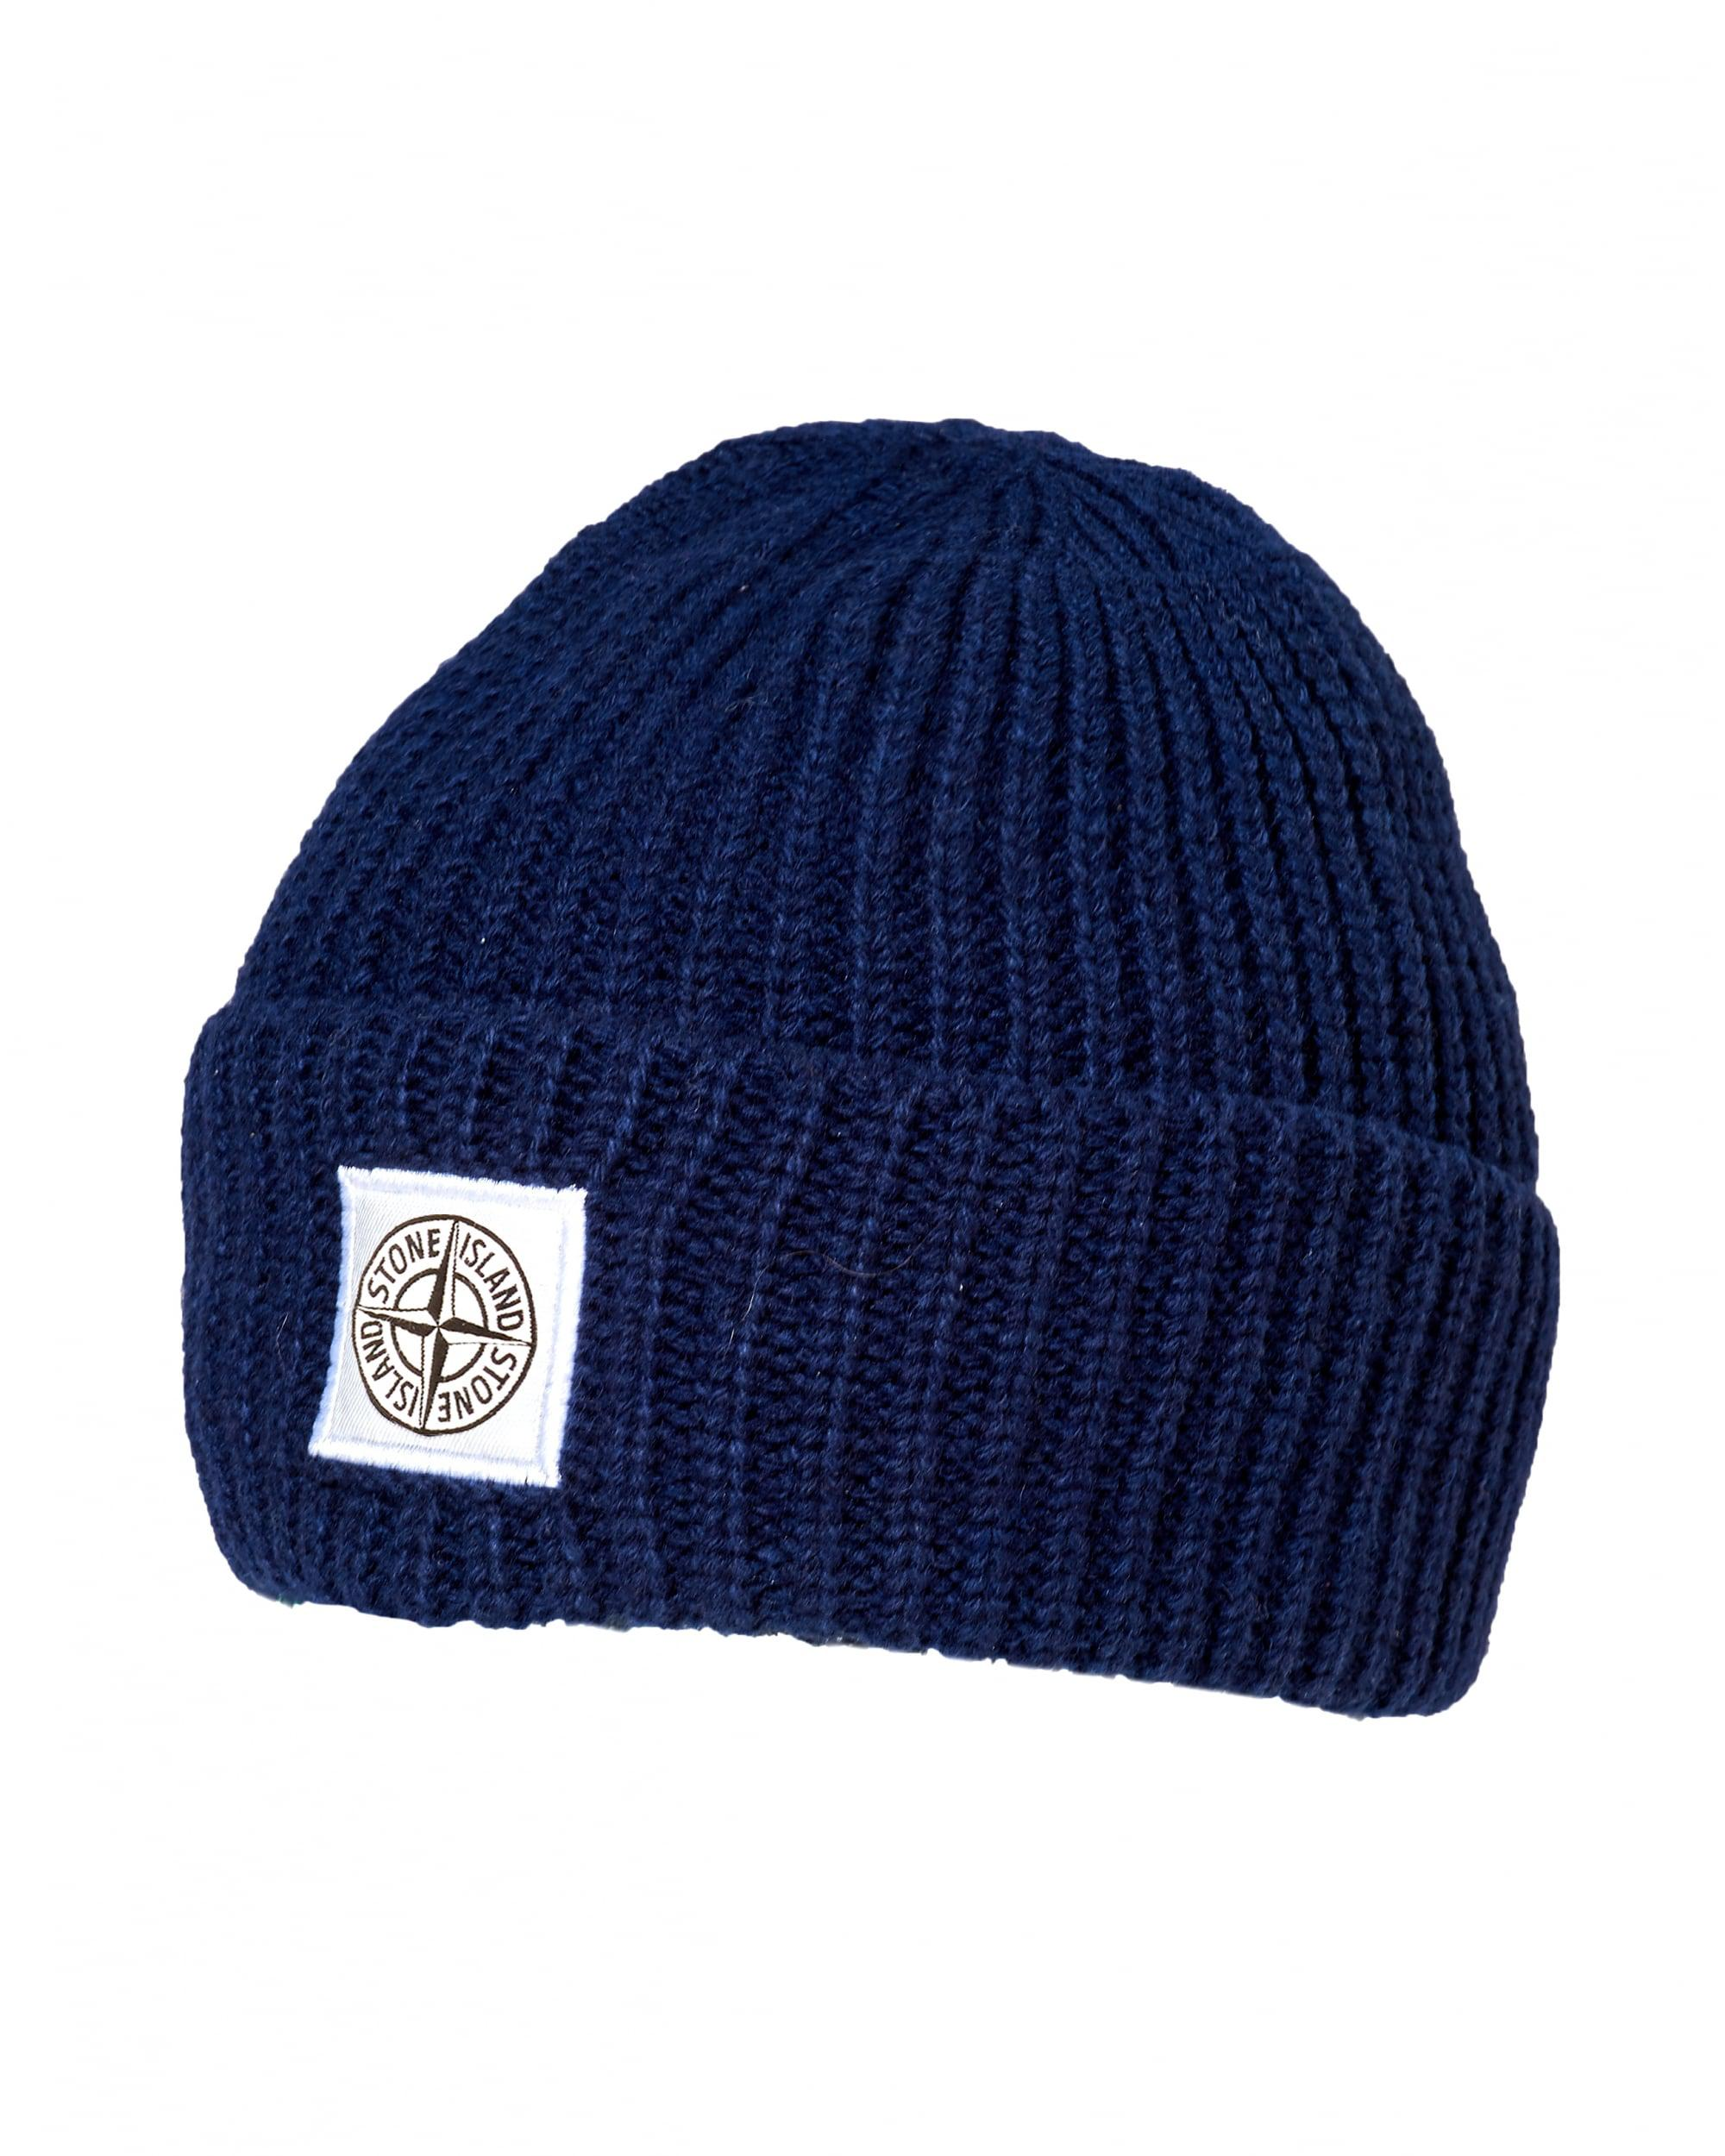 5c87b54d7 Stone Island Ribbed Beanie, Patch Logo Blue Marine Hat for Men - Lyst